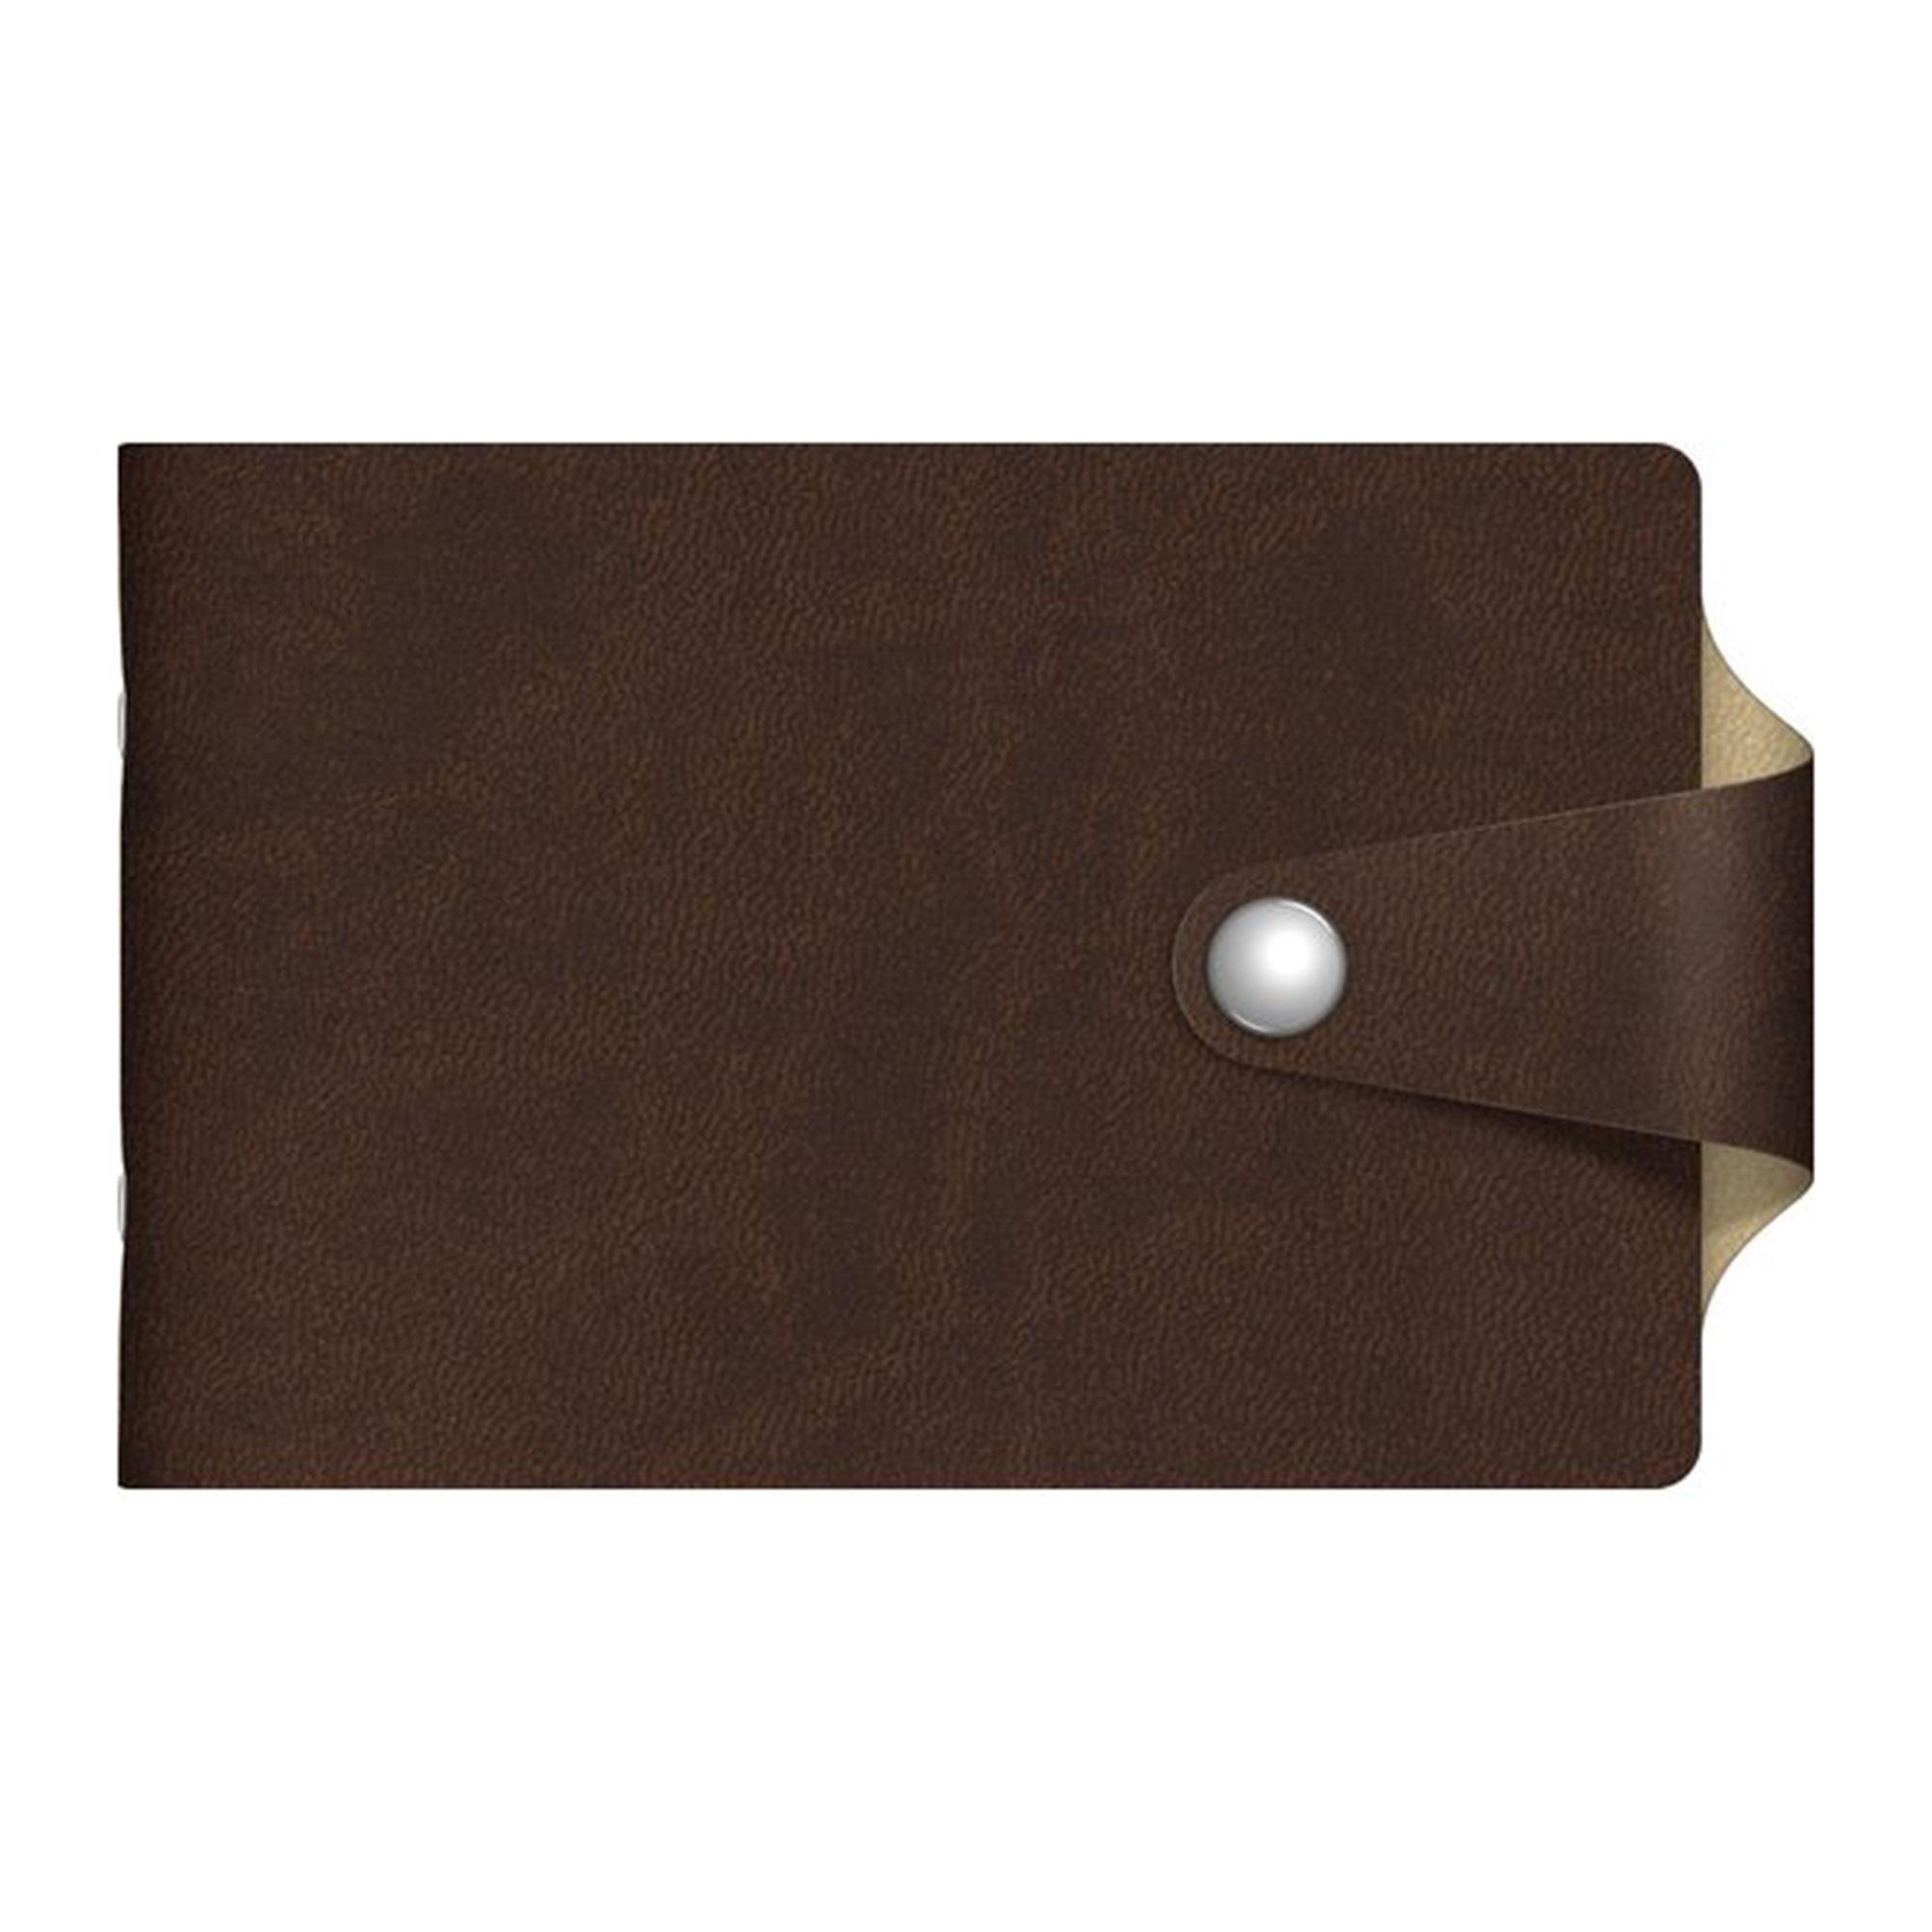 Визитница Hatber 12 карманов Vivella Bicolour коричневый/бежевый